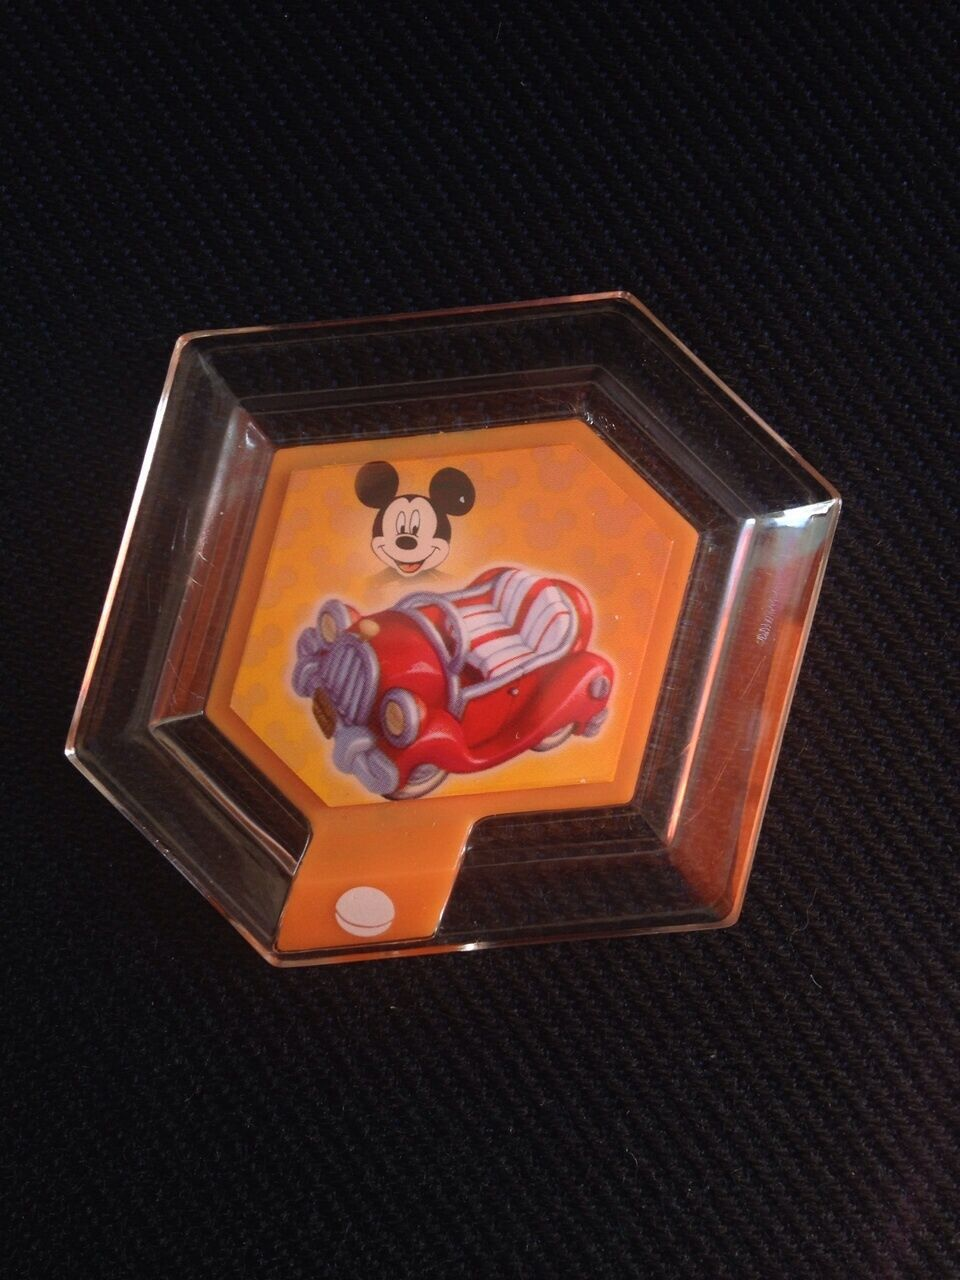 Disney Infinity Bonus Coins Series 1 - to the Search